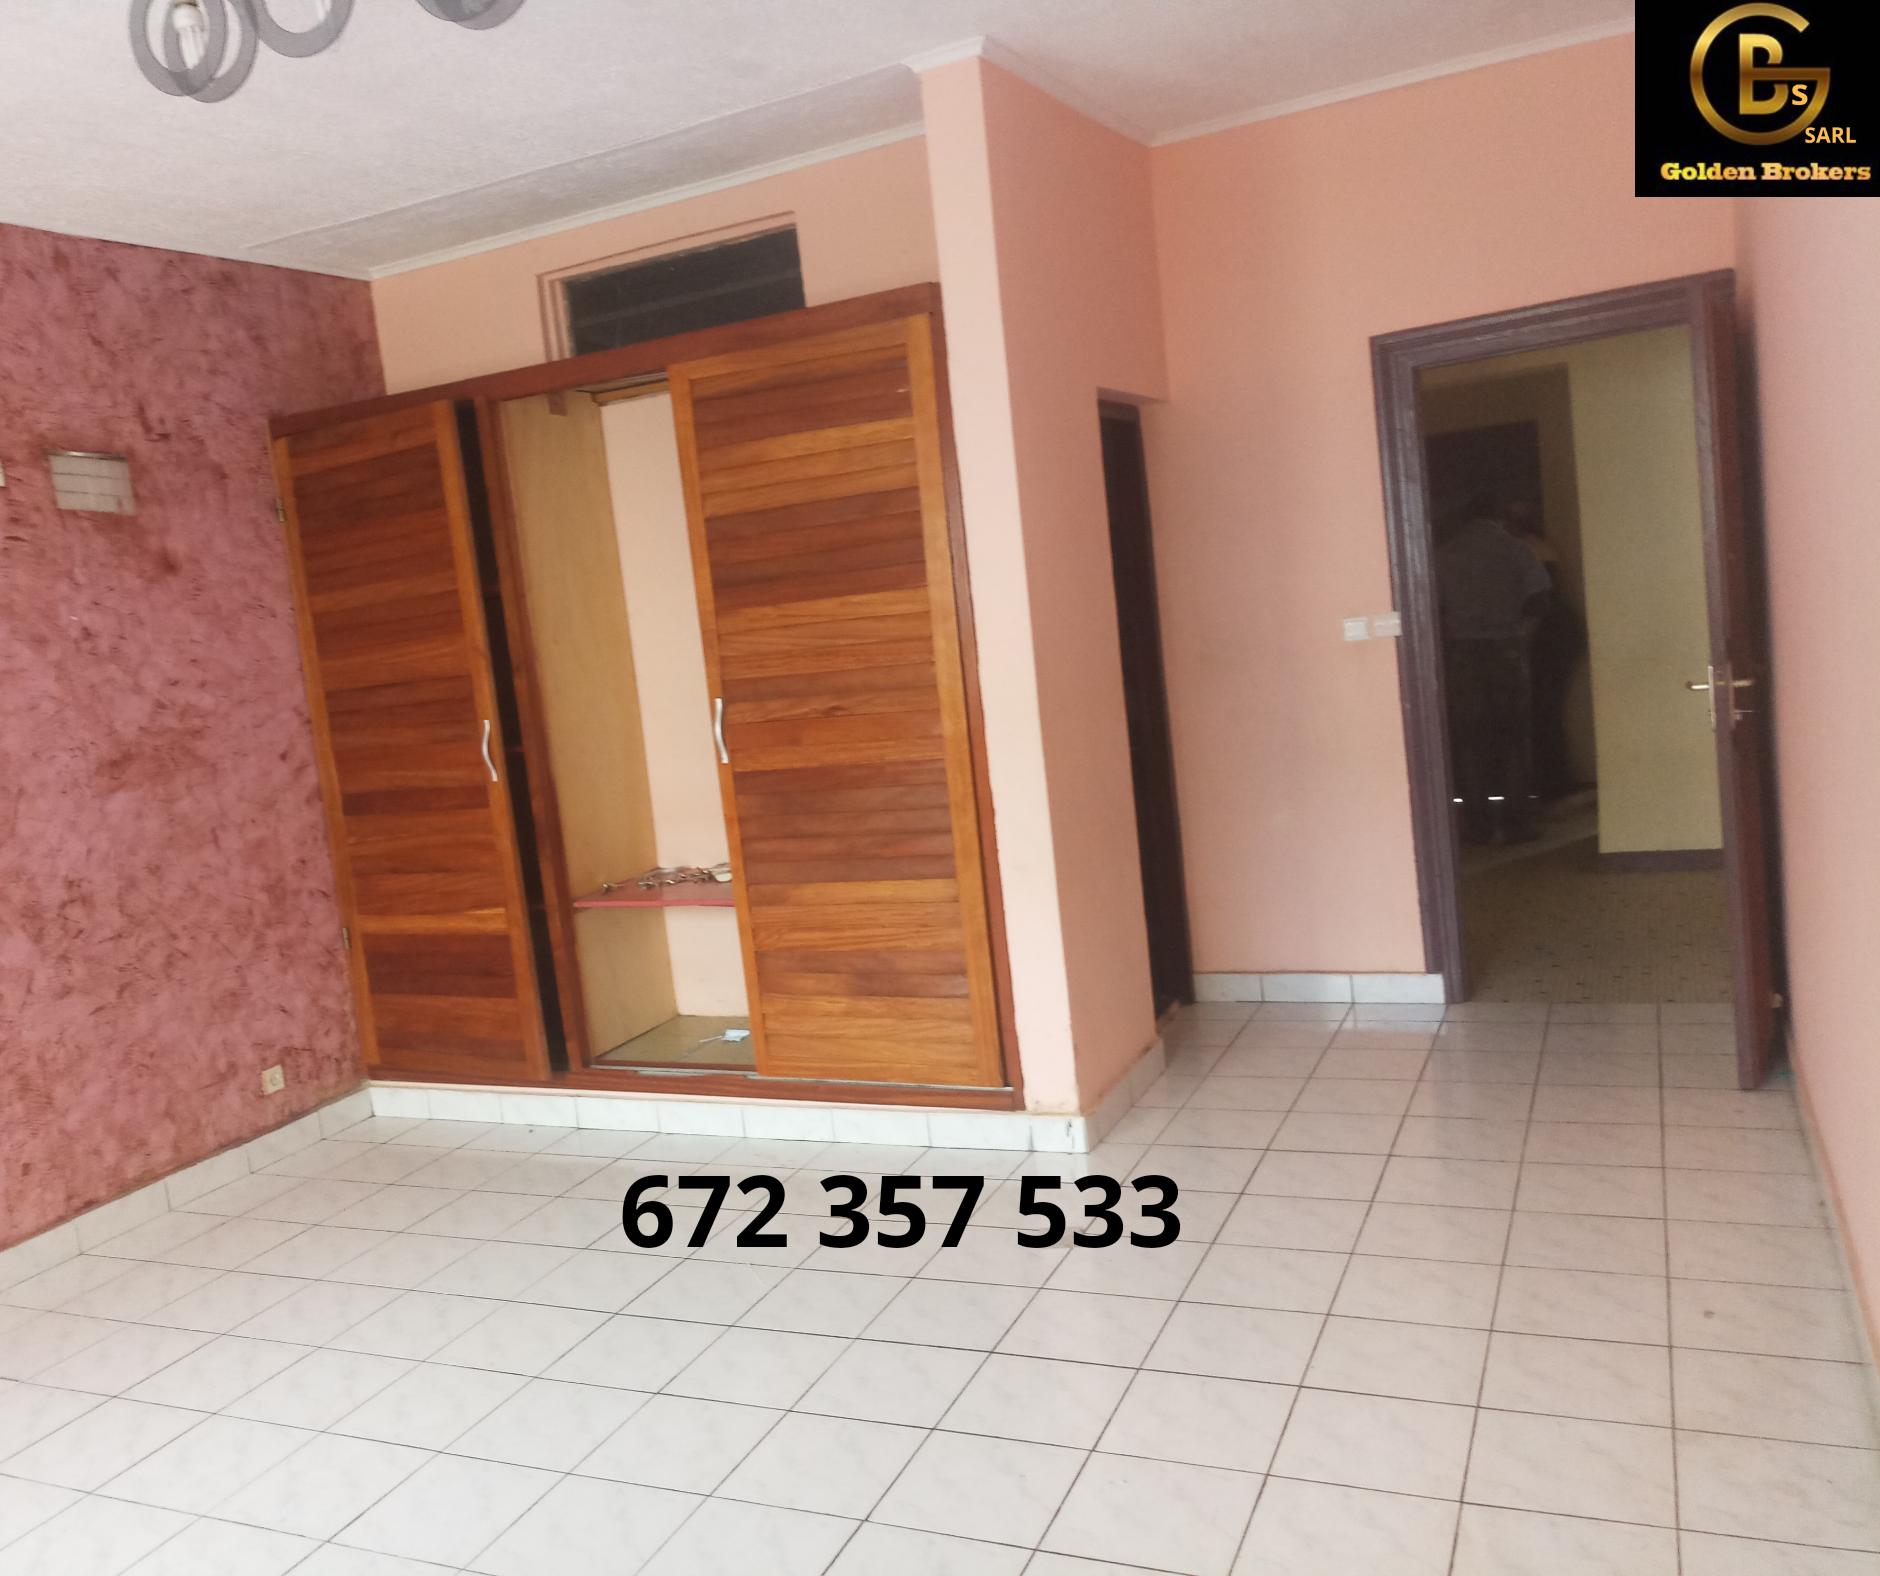 House (Villa) to rent - Douala, Bonapriso, Hydrocarbures - 1 living room(s), 3 bedroom(s), 2 bathroom(s) - 1 500 000 FCFA / month